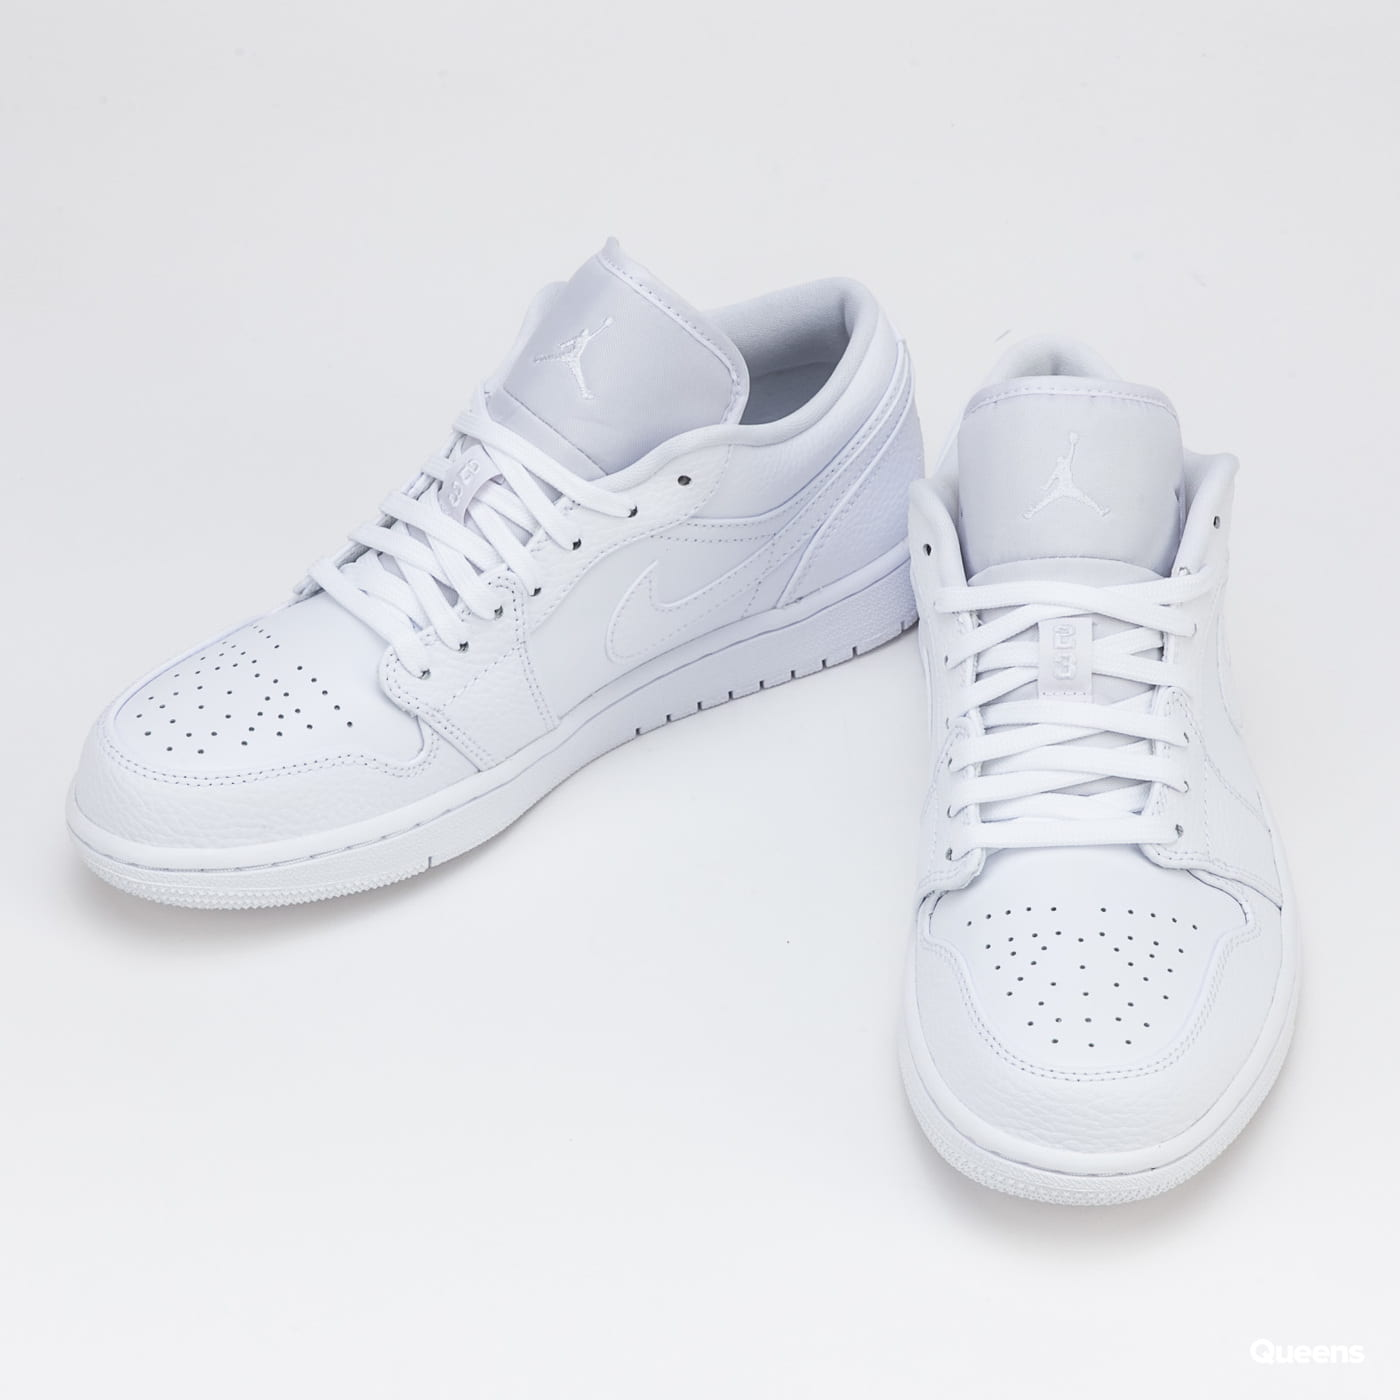 Jordan Air Jordan 1 Low white / white - white